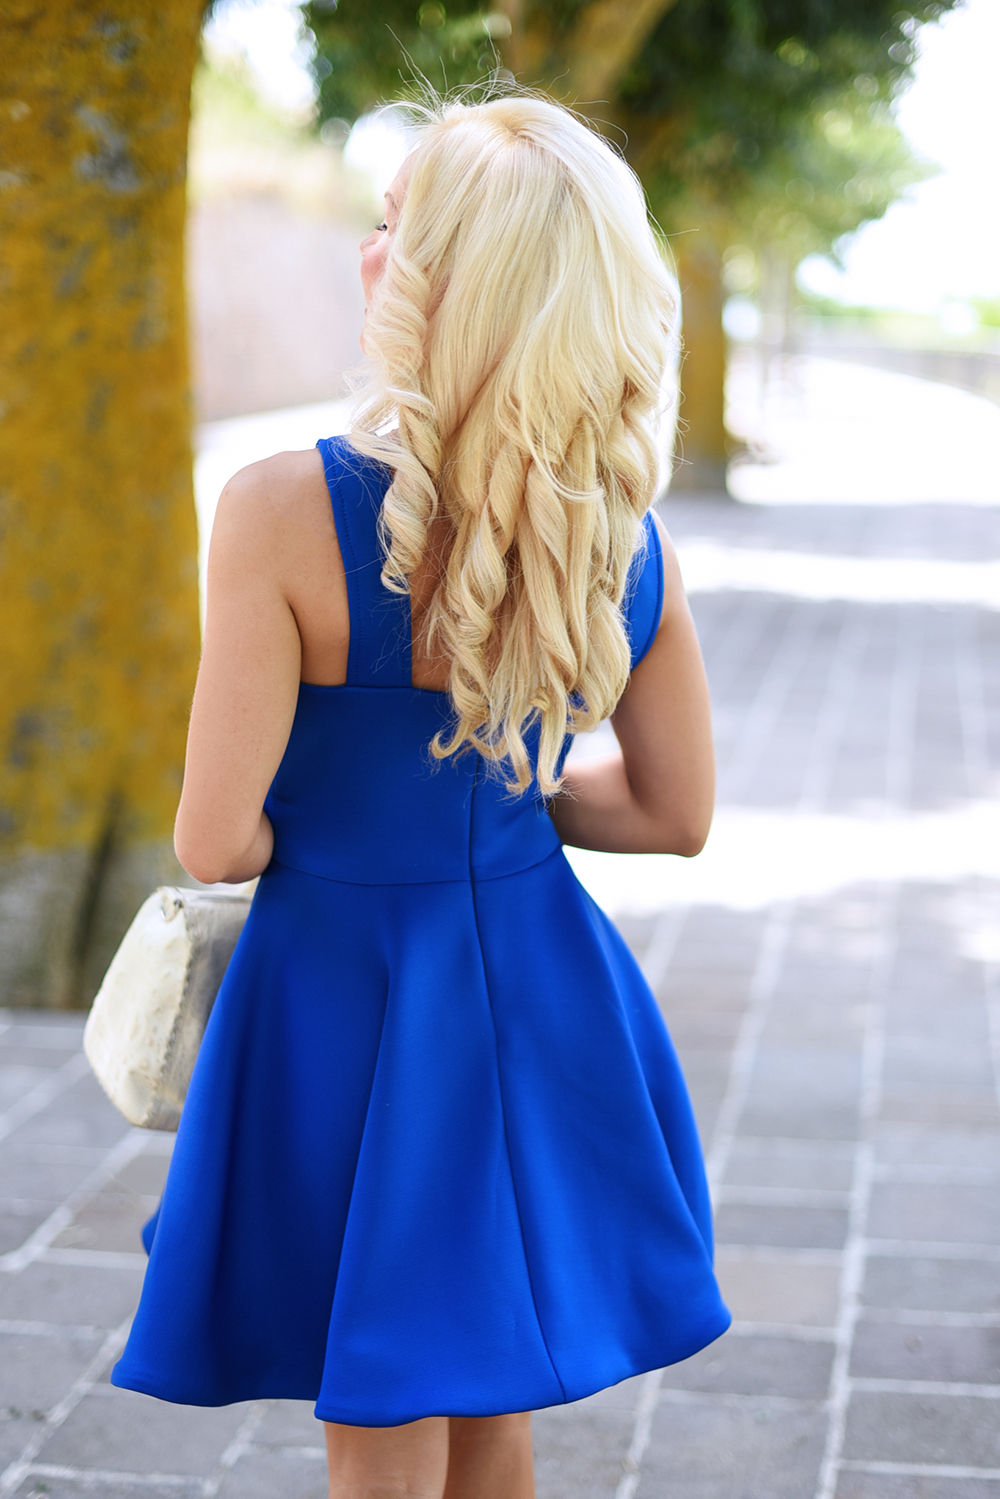 come indossare il blu, vestiti blu, vestiti Sheinside, Sheinside opinioni, Sheinside affidabile, pumps in vernice, TUUM anelli, anelli INFINITUUM prezzi – outfit summer 2015 blog It-Girl by Eleonora Petrella